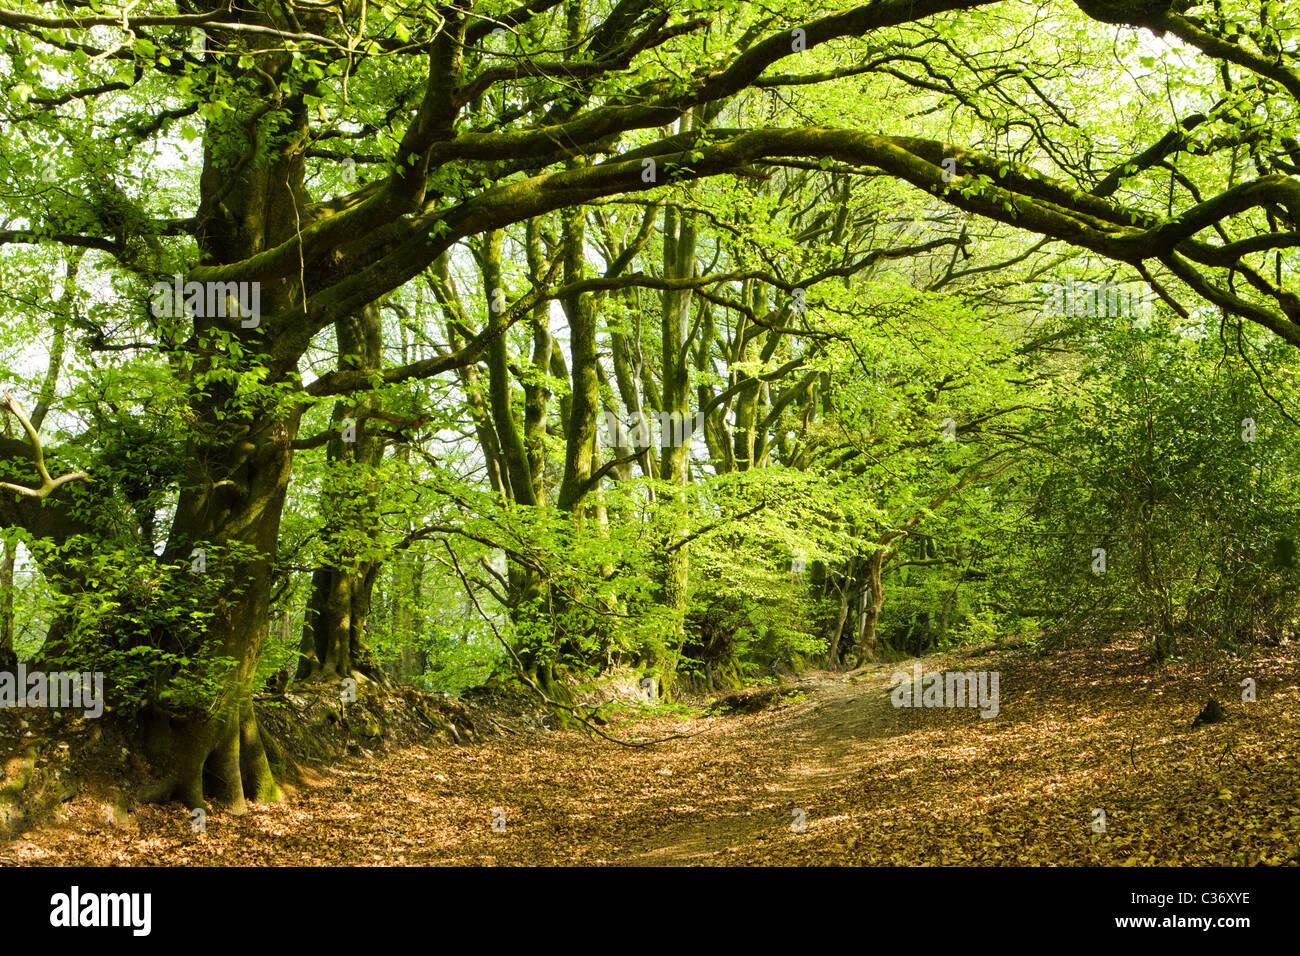 Bois Dommett, Somerset, Royaume-Uni. Les hêtres. Photo Stock